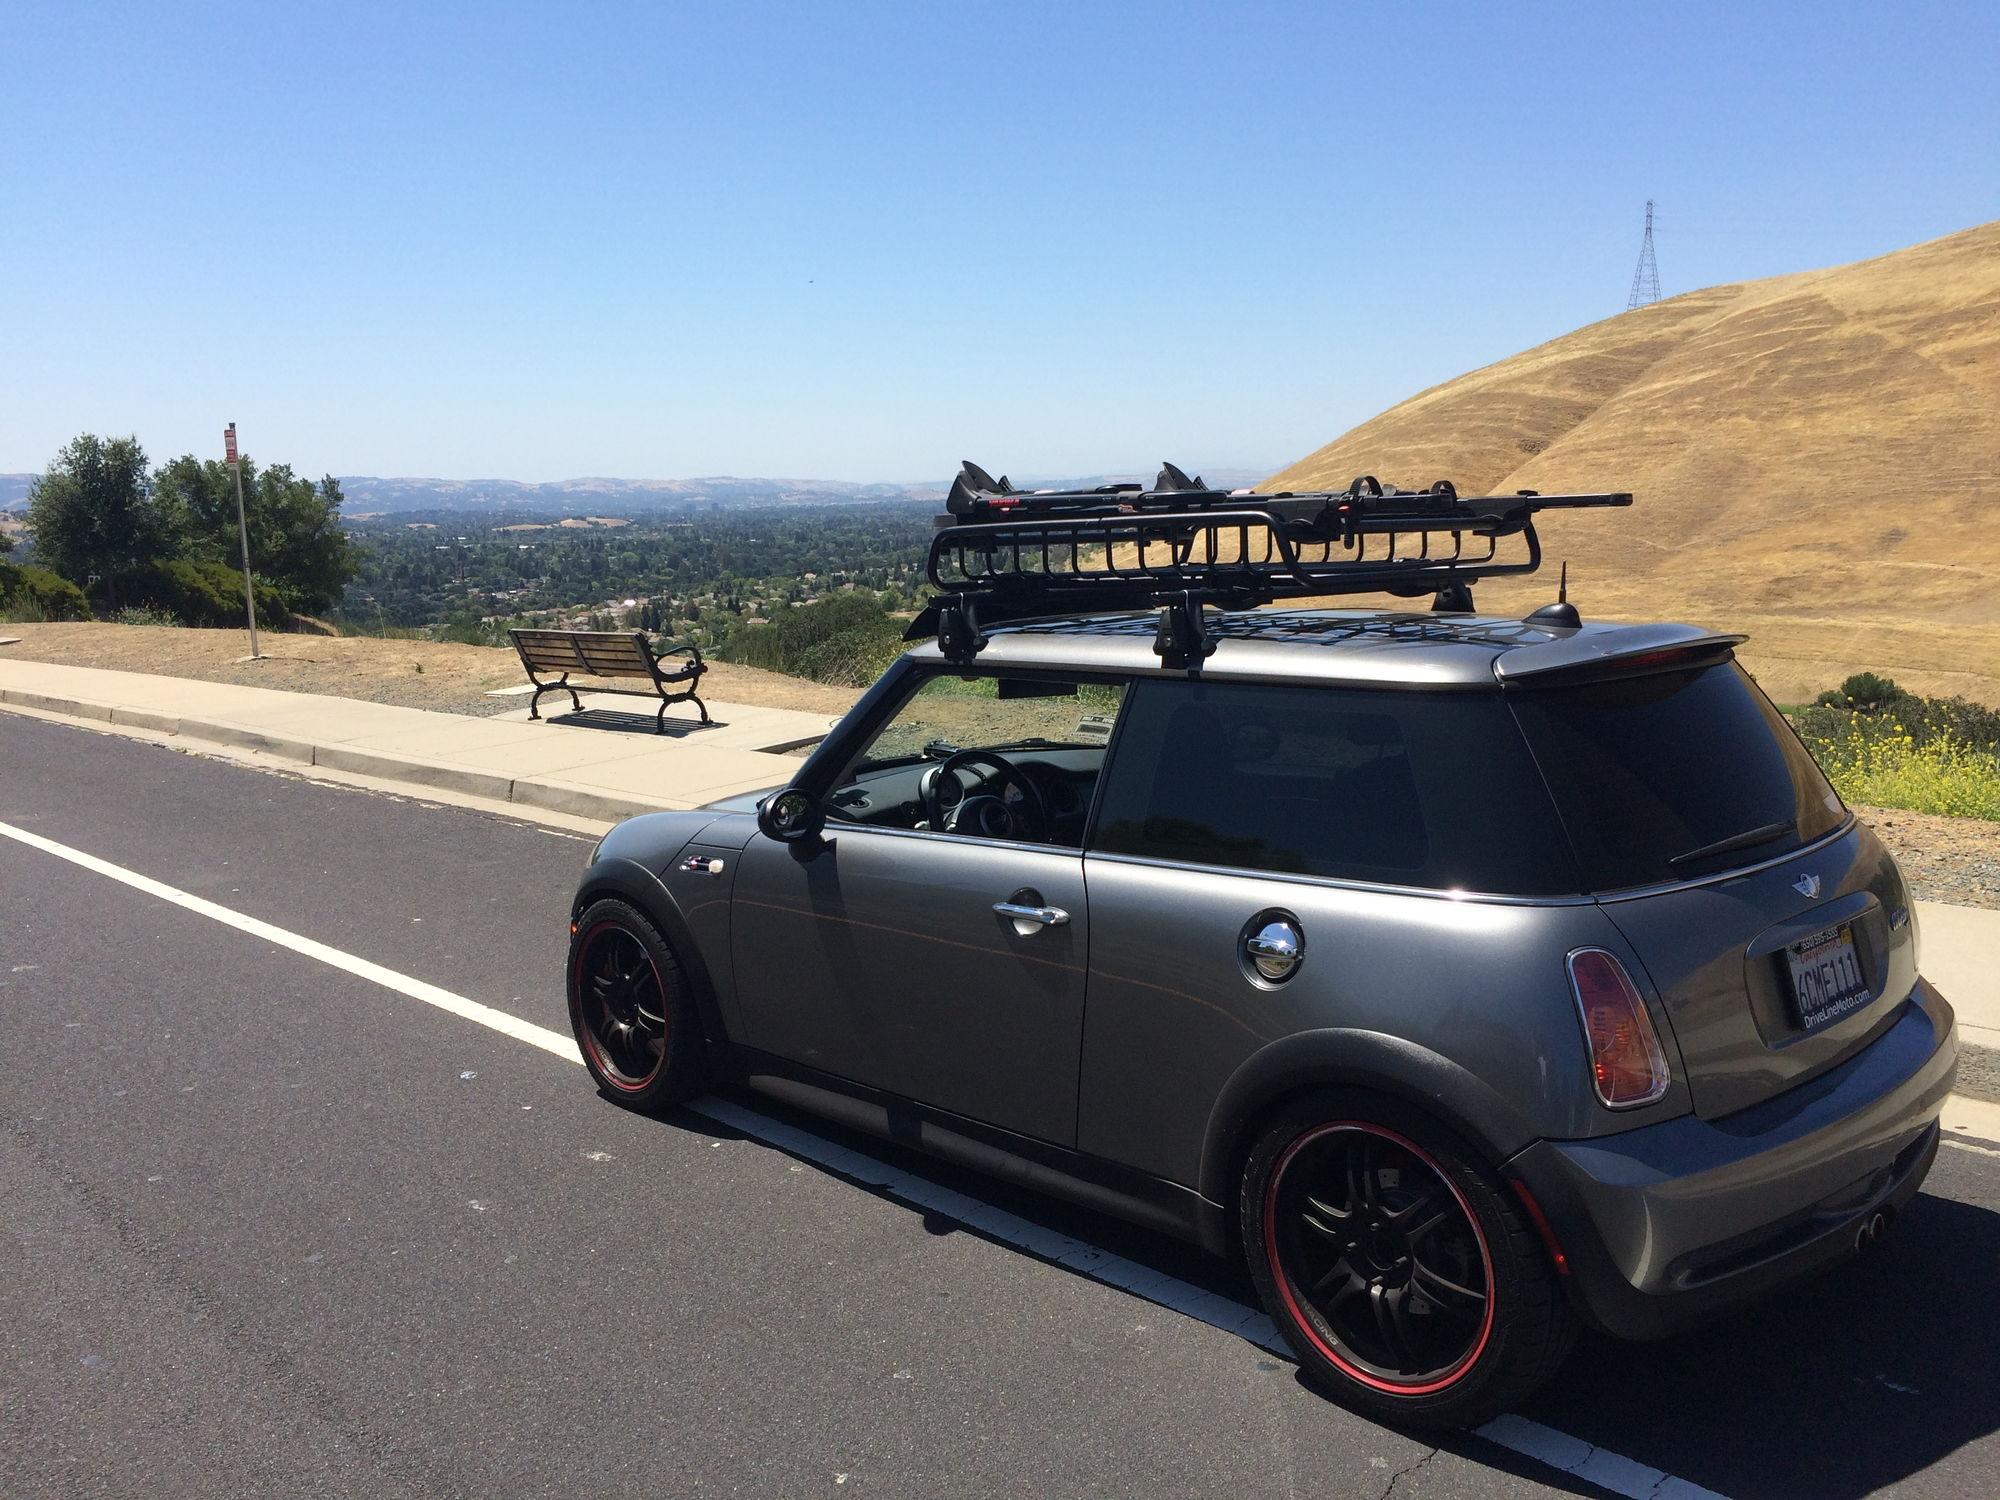 Wtb Yakima Or Thule Roof Rack North American Motoring